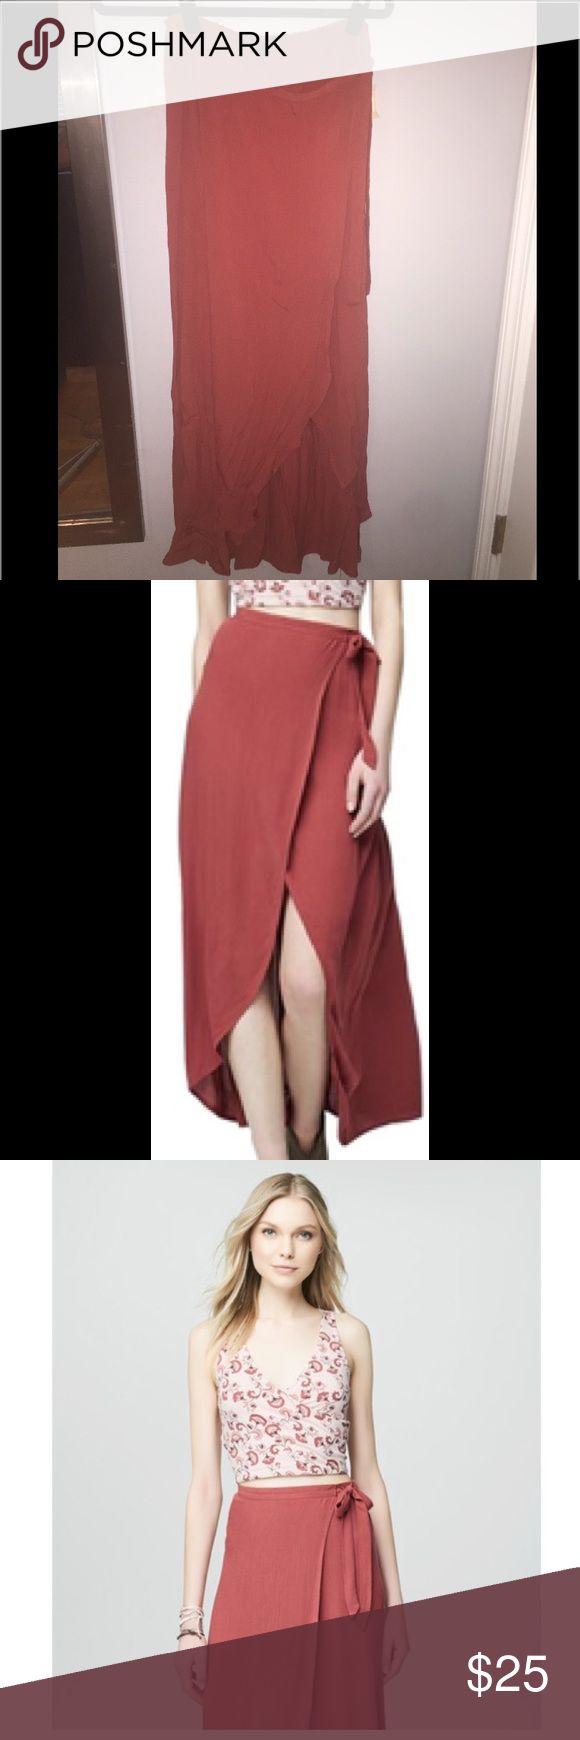 Maxi Wrap Skirt Super cute maxi wrap skirt. Light material. Brand new! Aeropostale Skirts Maxi